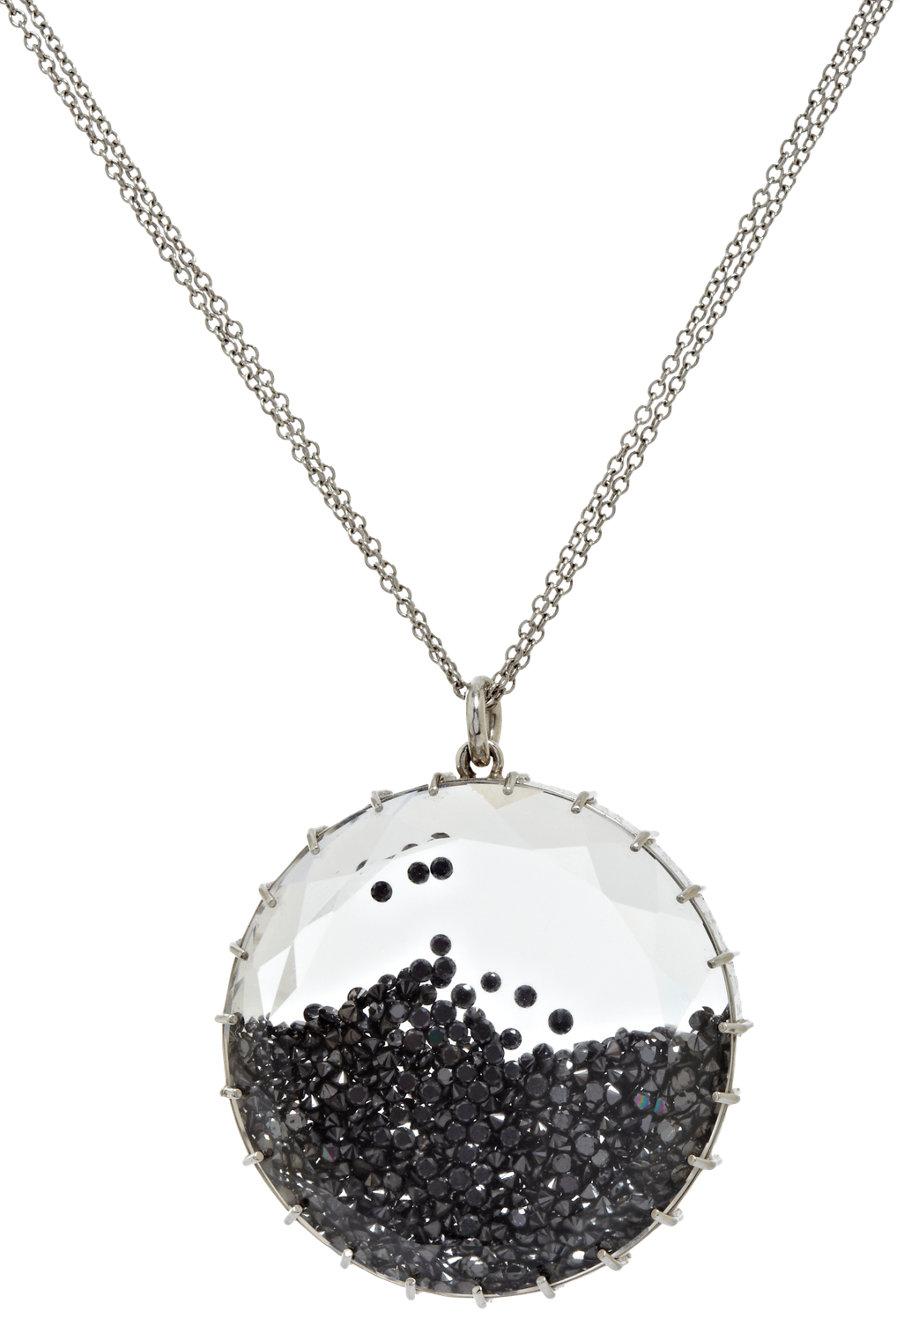 renee lewis white gold black diamond shake pendant. Black Bedroom Furniture Sets. Home Design Ideas